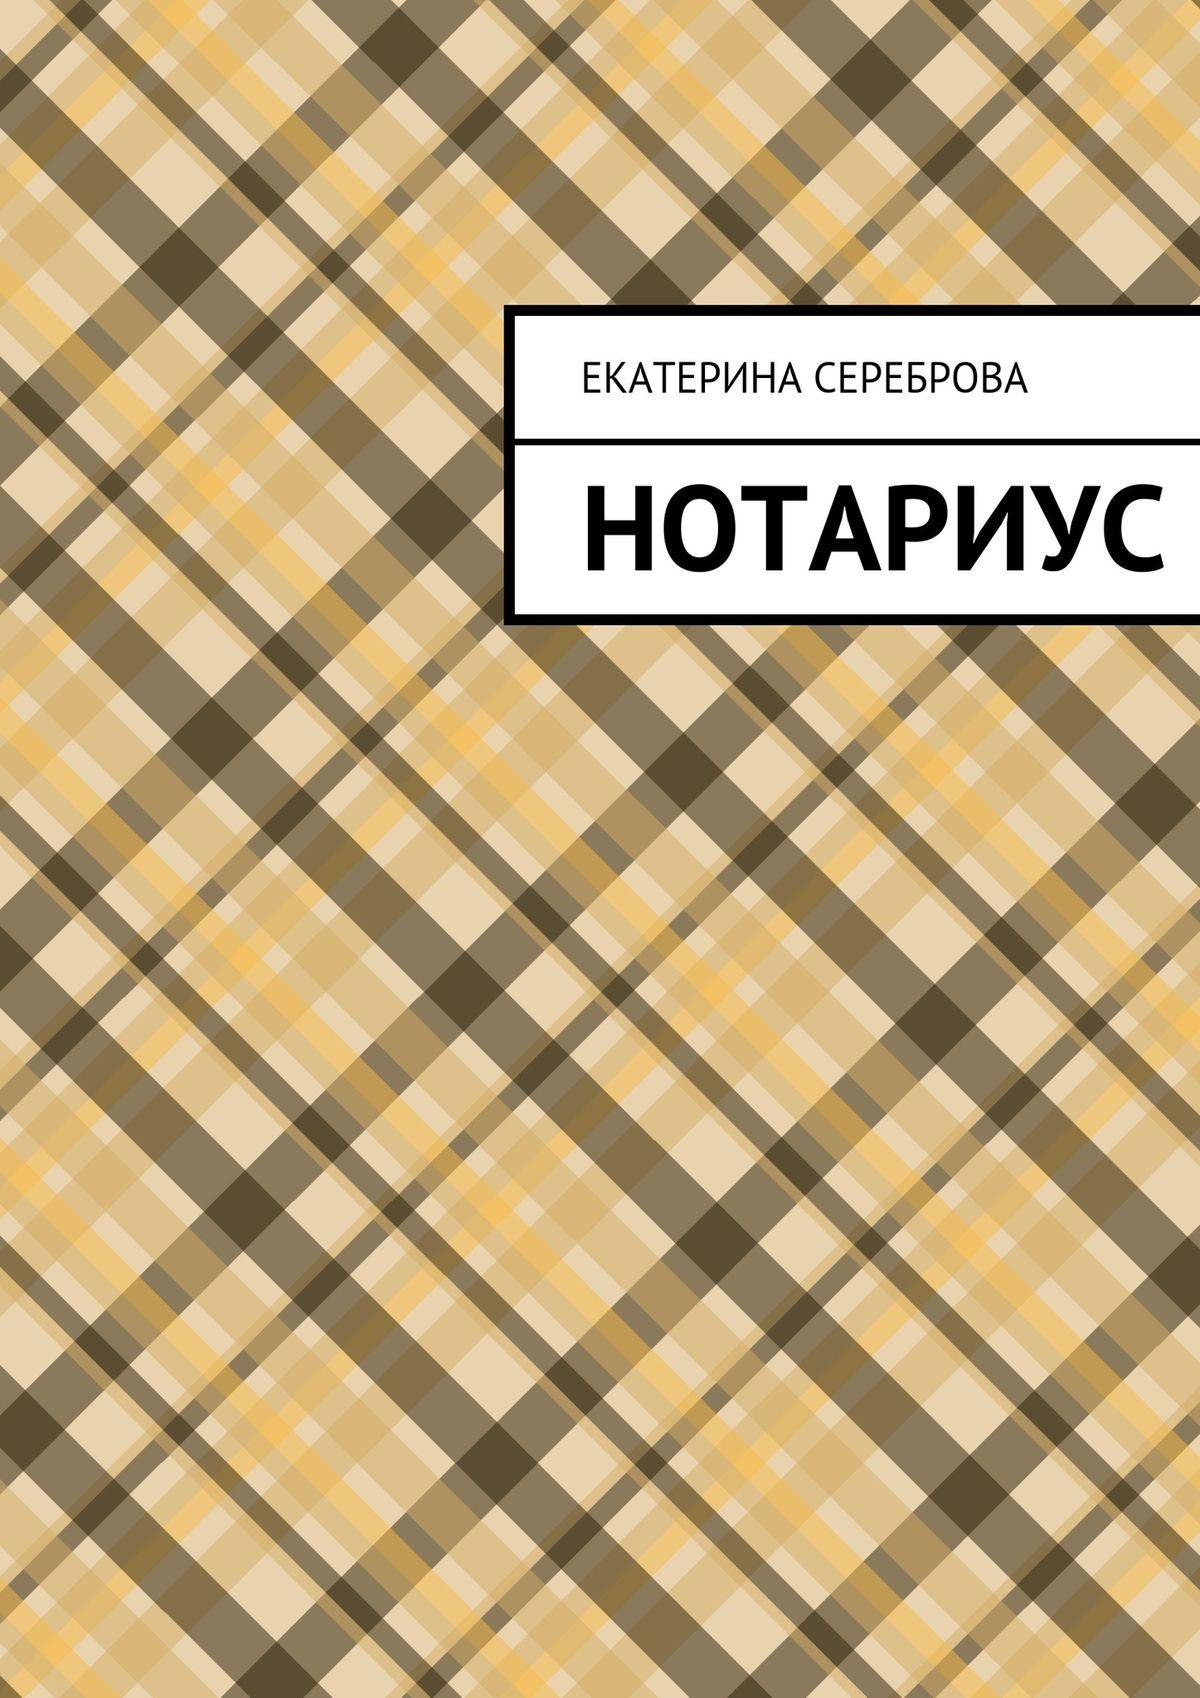 Екатерина Сереброва Нотариус екатерина сереброва нотариус